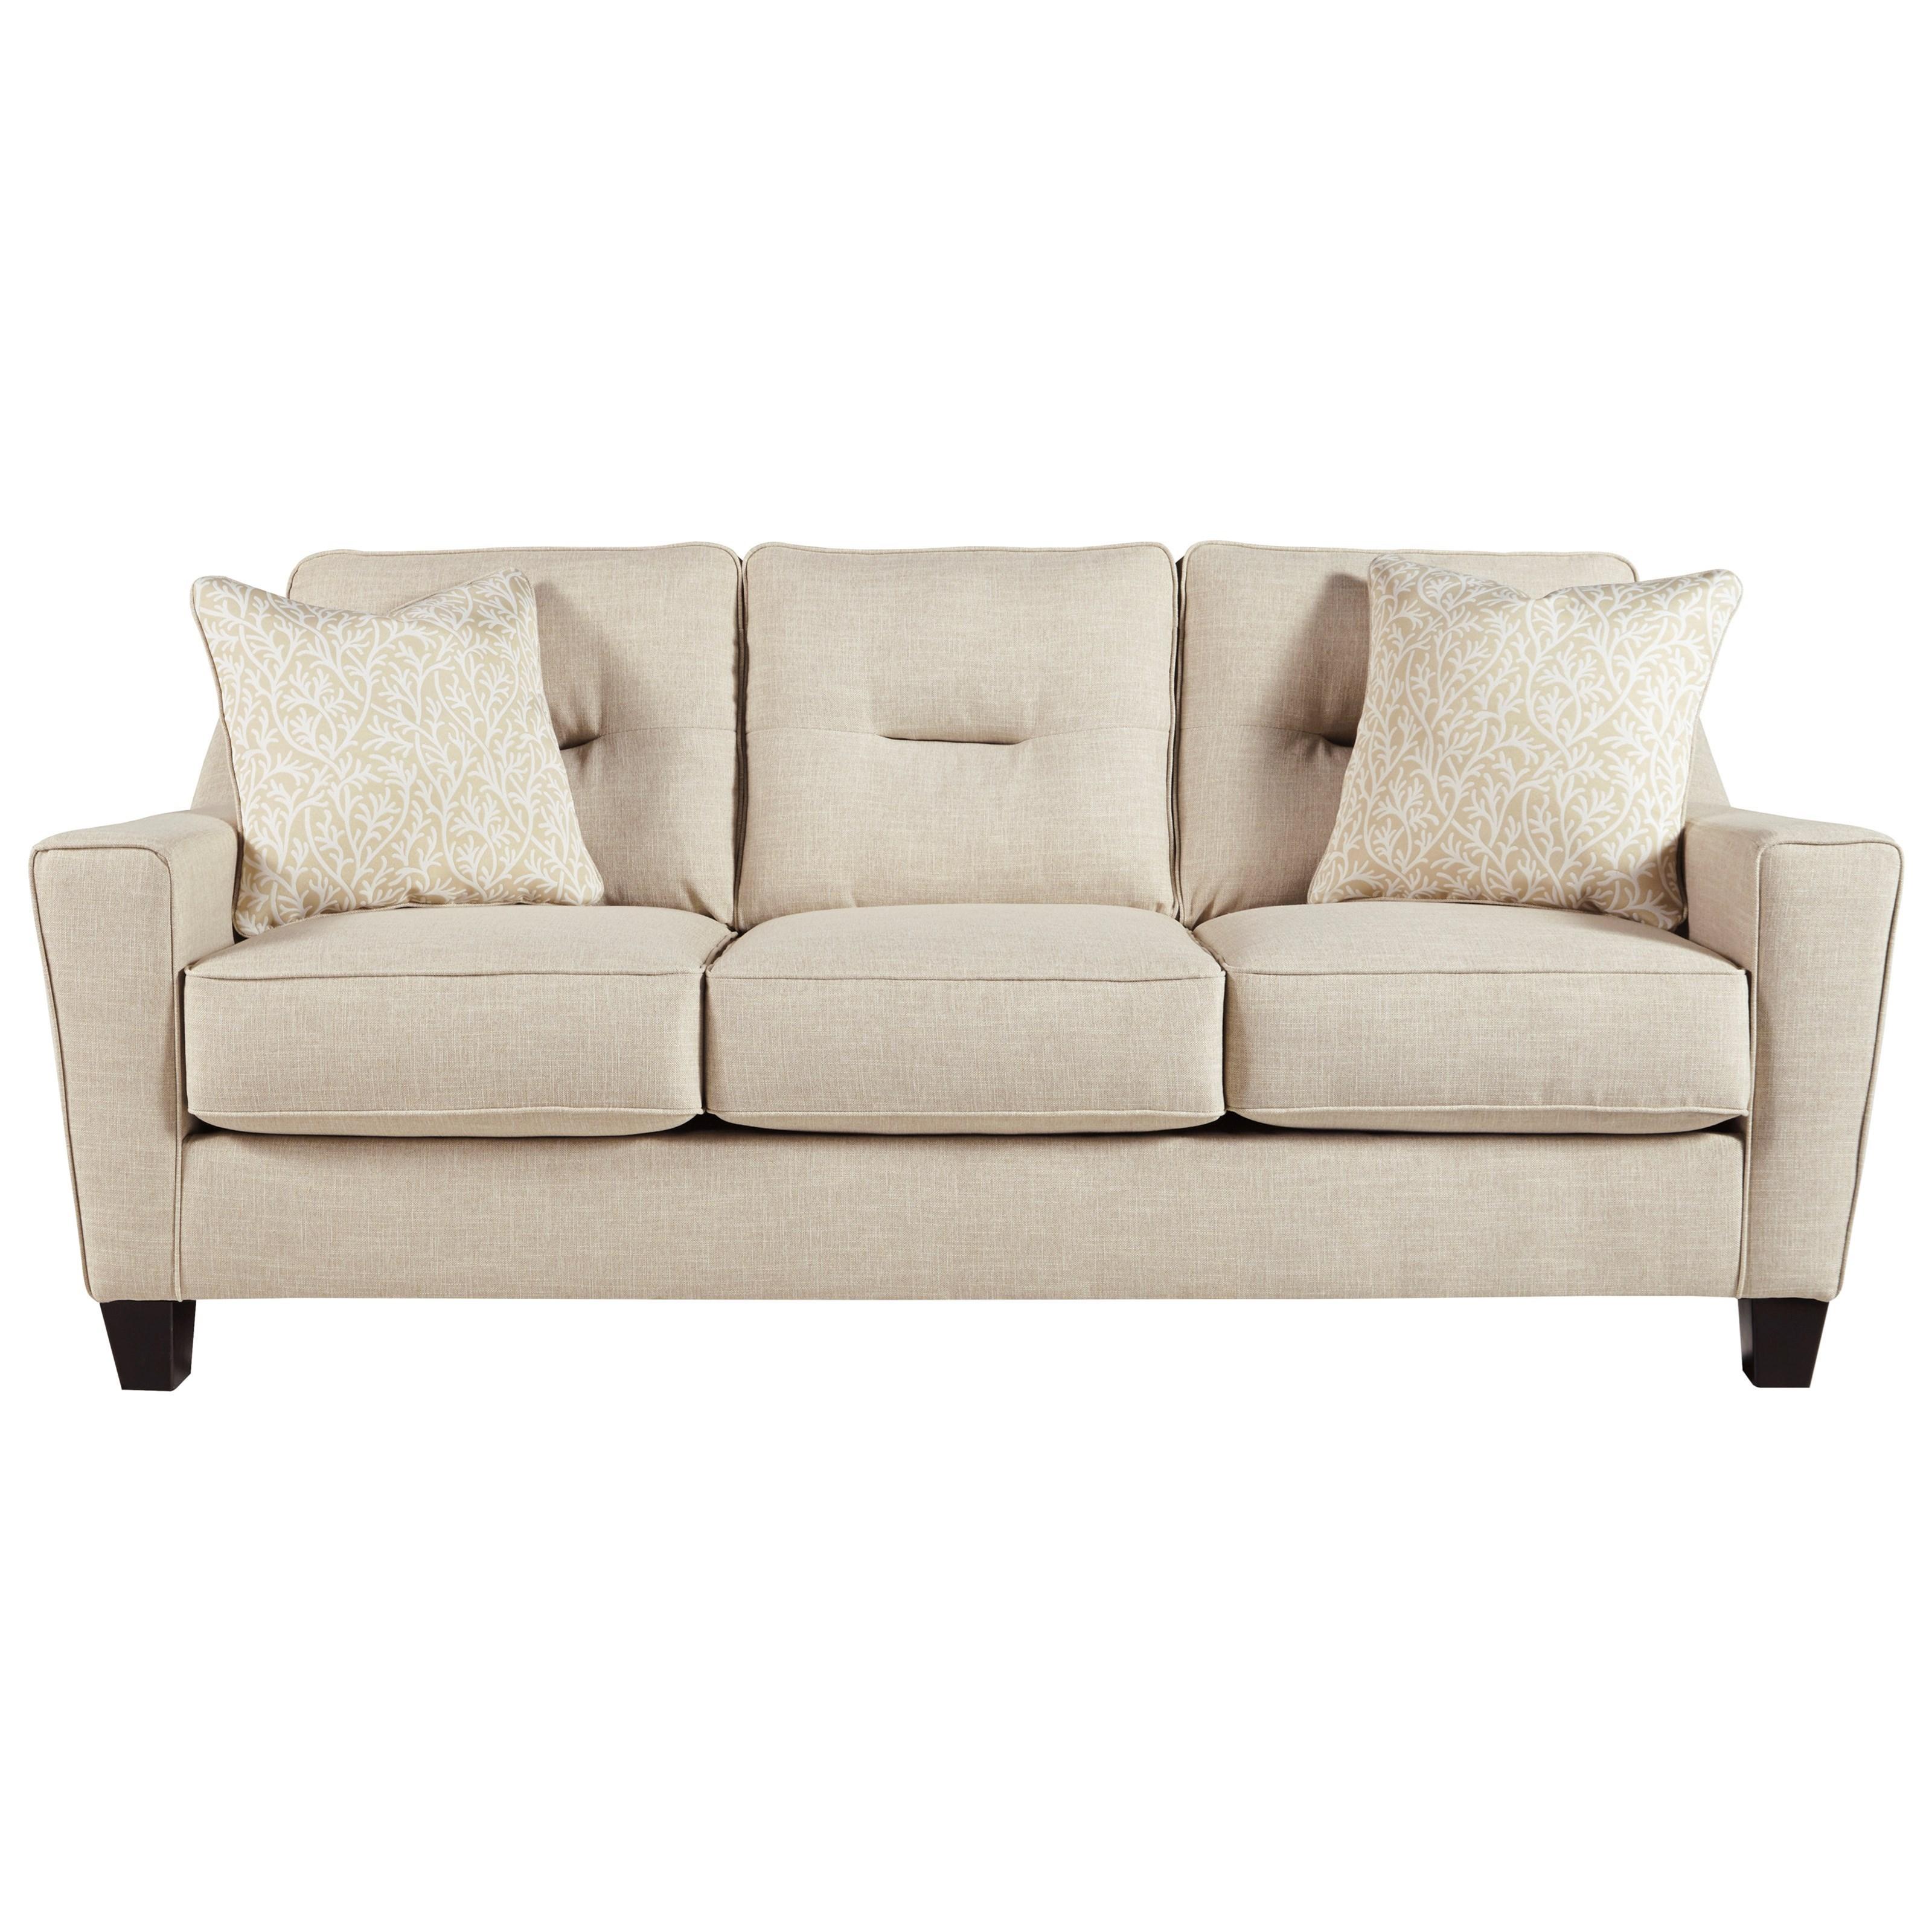 Benchcraft Forsan Nuvella Queen Sofa Sleeper - Item Number: 6690539